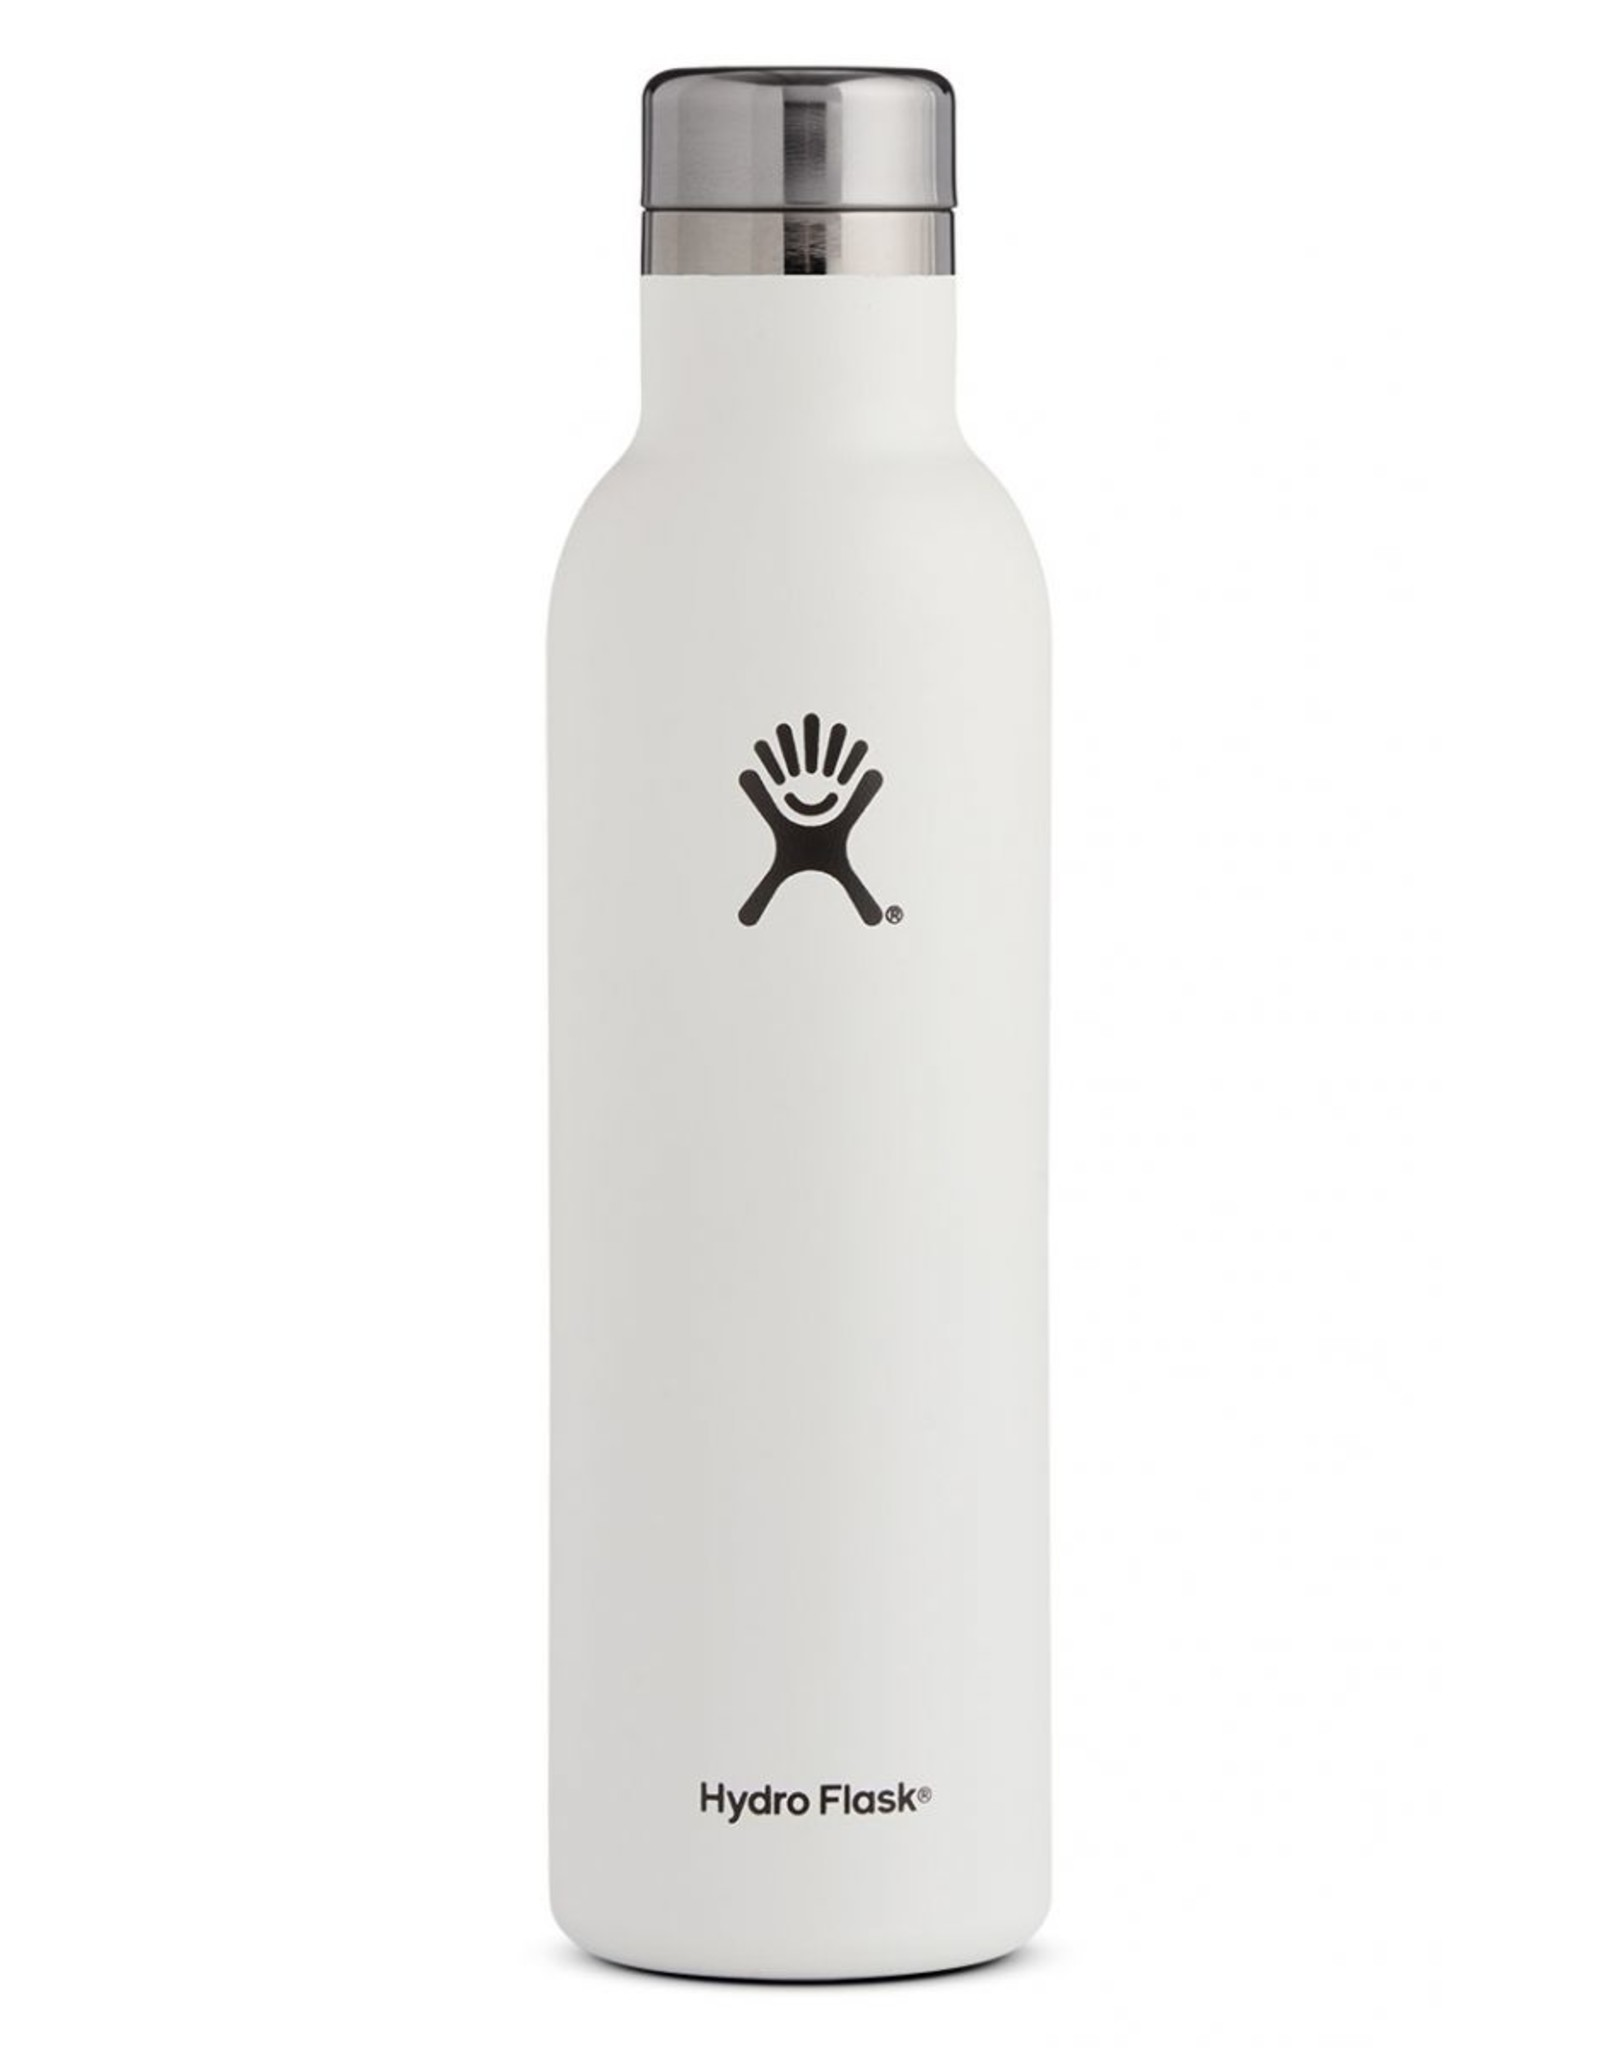 Hydroflask HYDROFLASK 25 OZ WINE BOTTLE